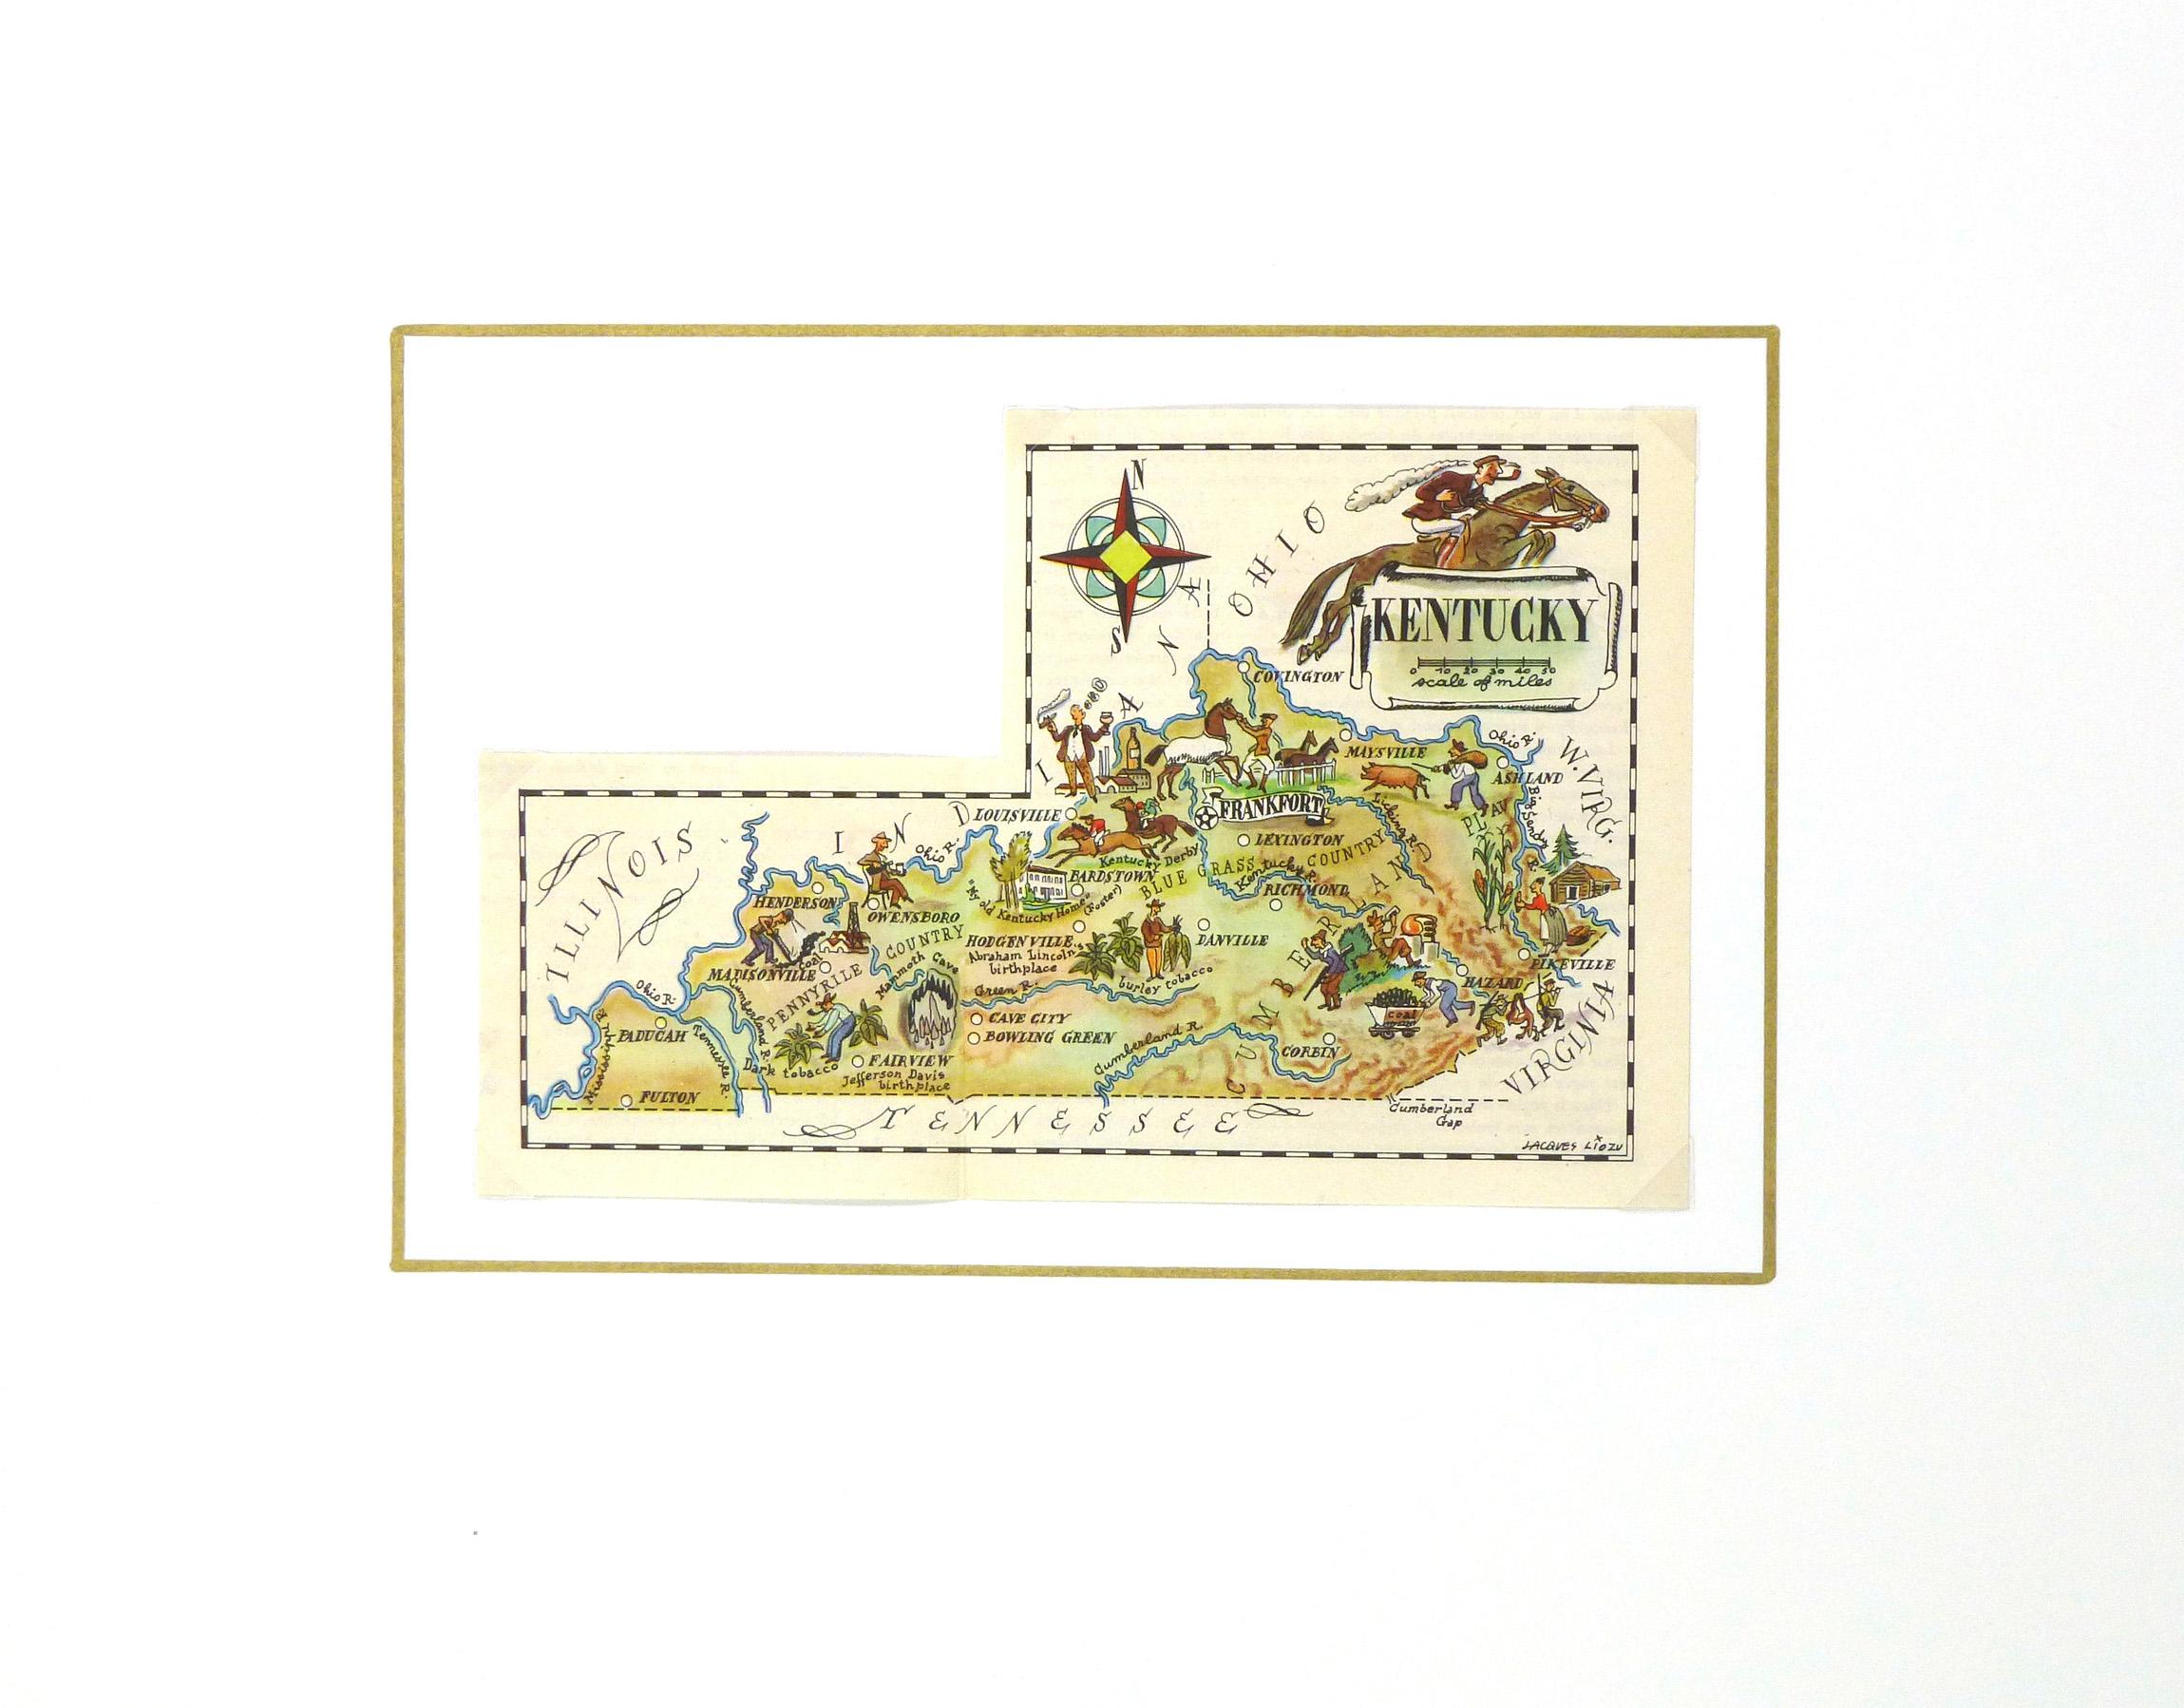 Kentucky Pictorial Map, 1946-matted-6262K